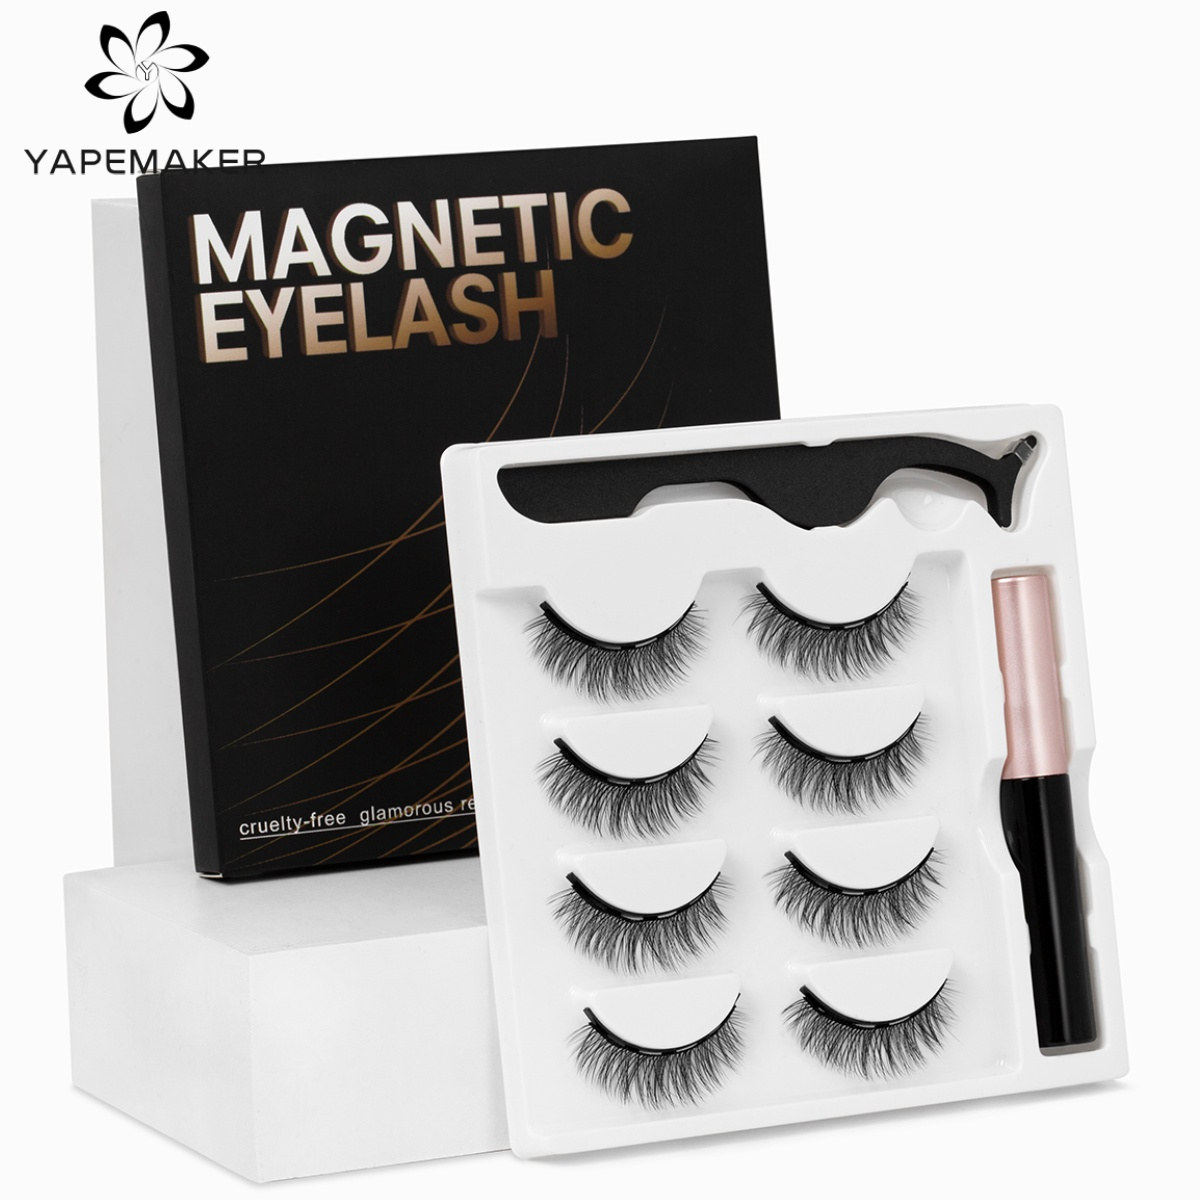 YAPEMAKER Magnetic Eyelashes 3D False Mink Eyelashes Magnet Lashes Magnetic Eyeliner&Tweezer Set Makeup pestañas magneticas